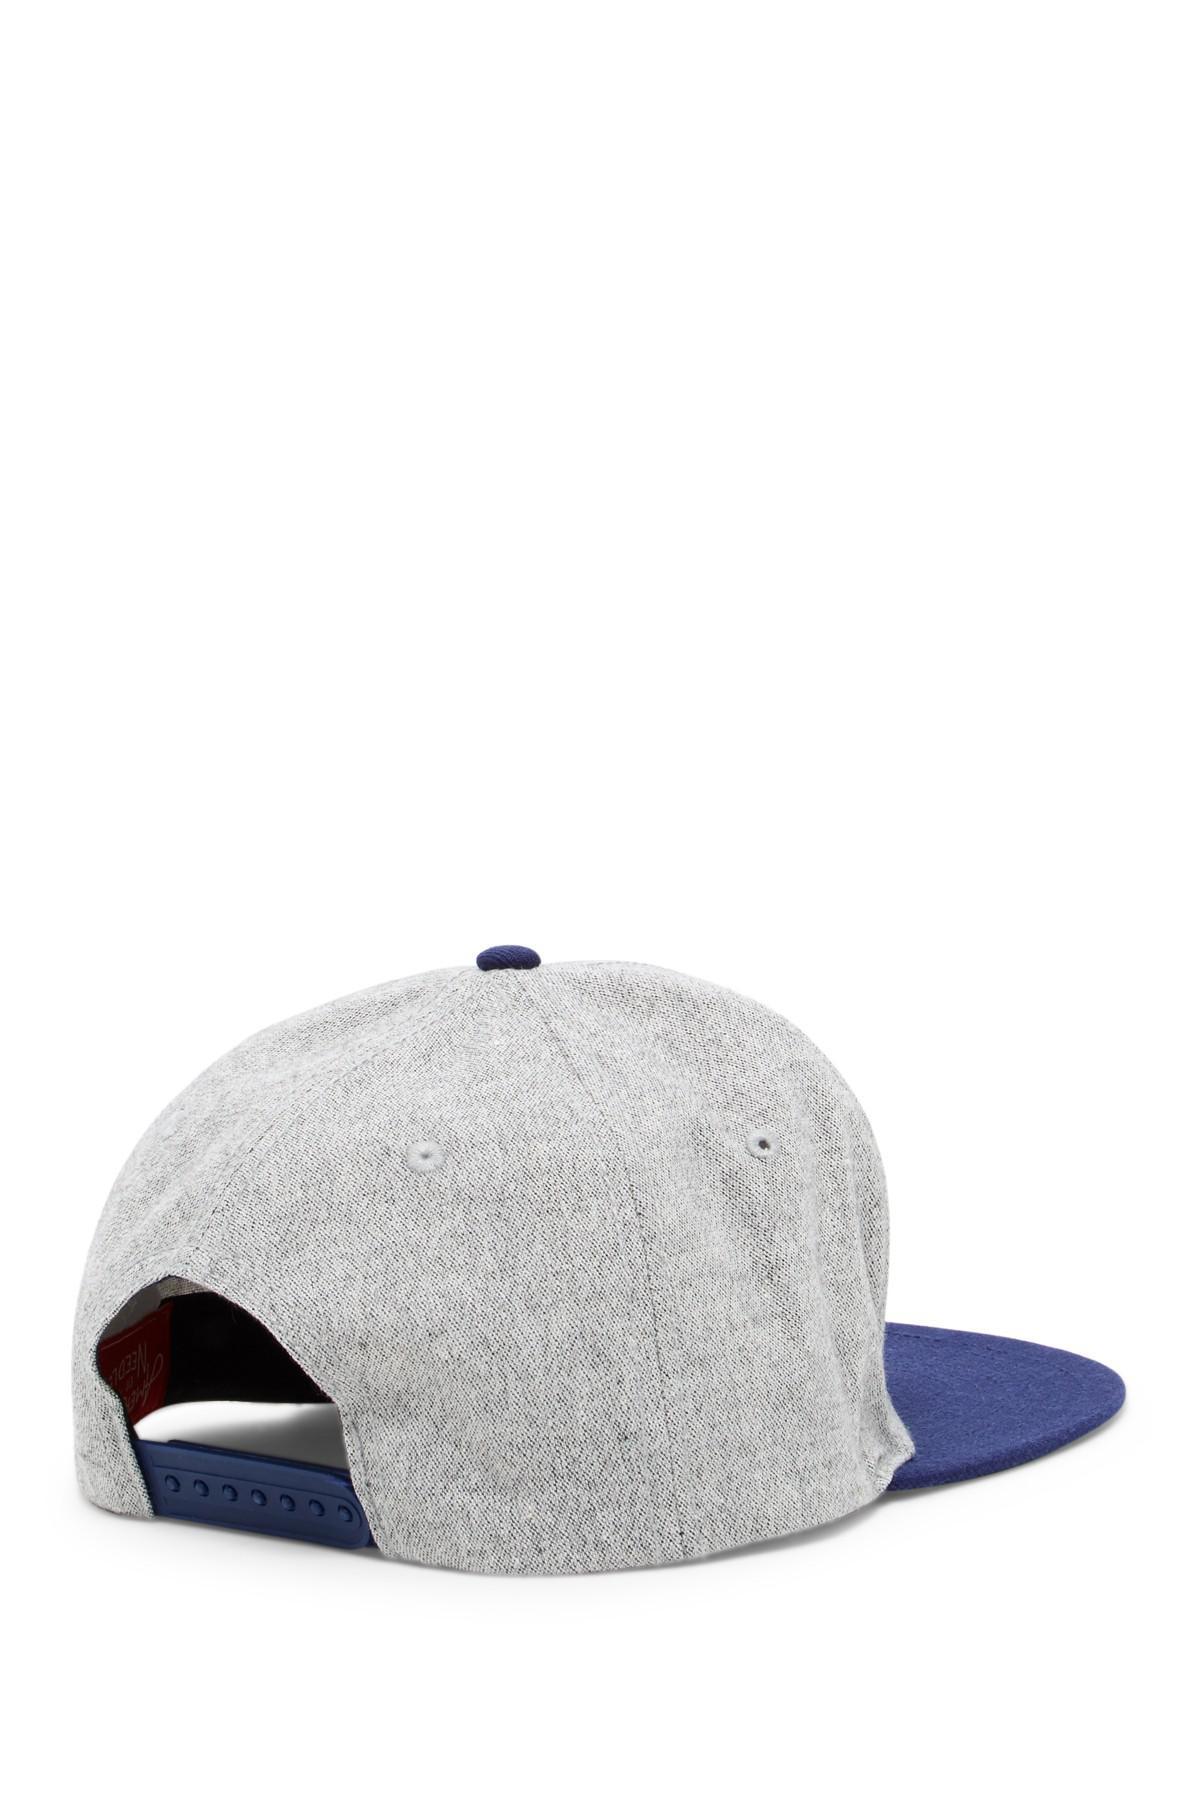 7f1f5a525b2fc Lyst - American Needle Pittsburgh Penguin Castle Rock Baseball Cap ...